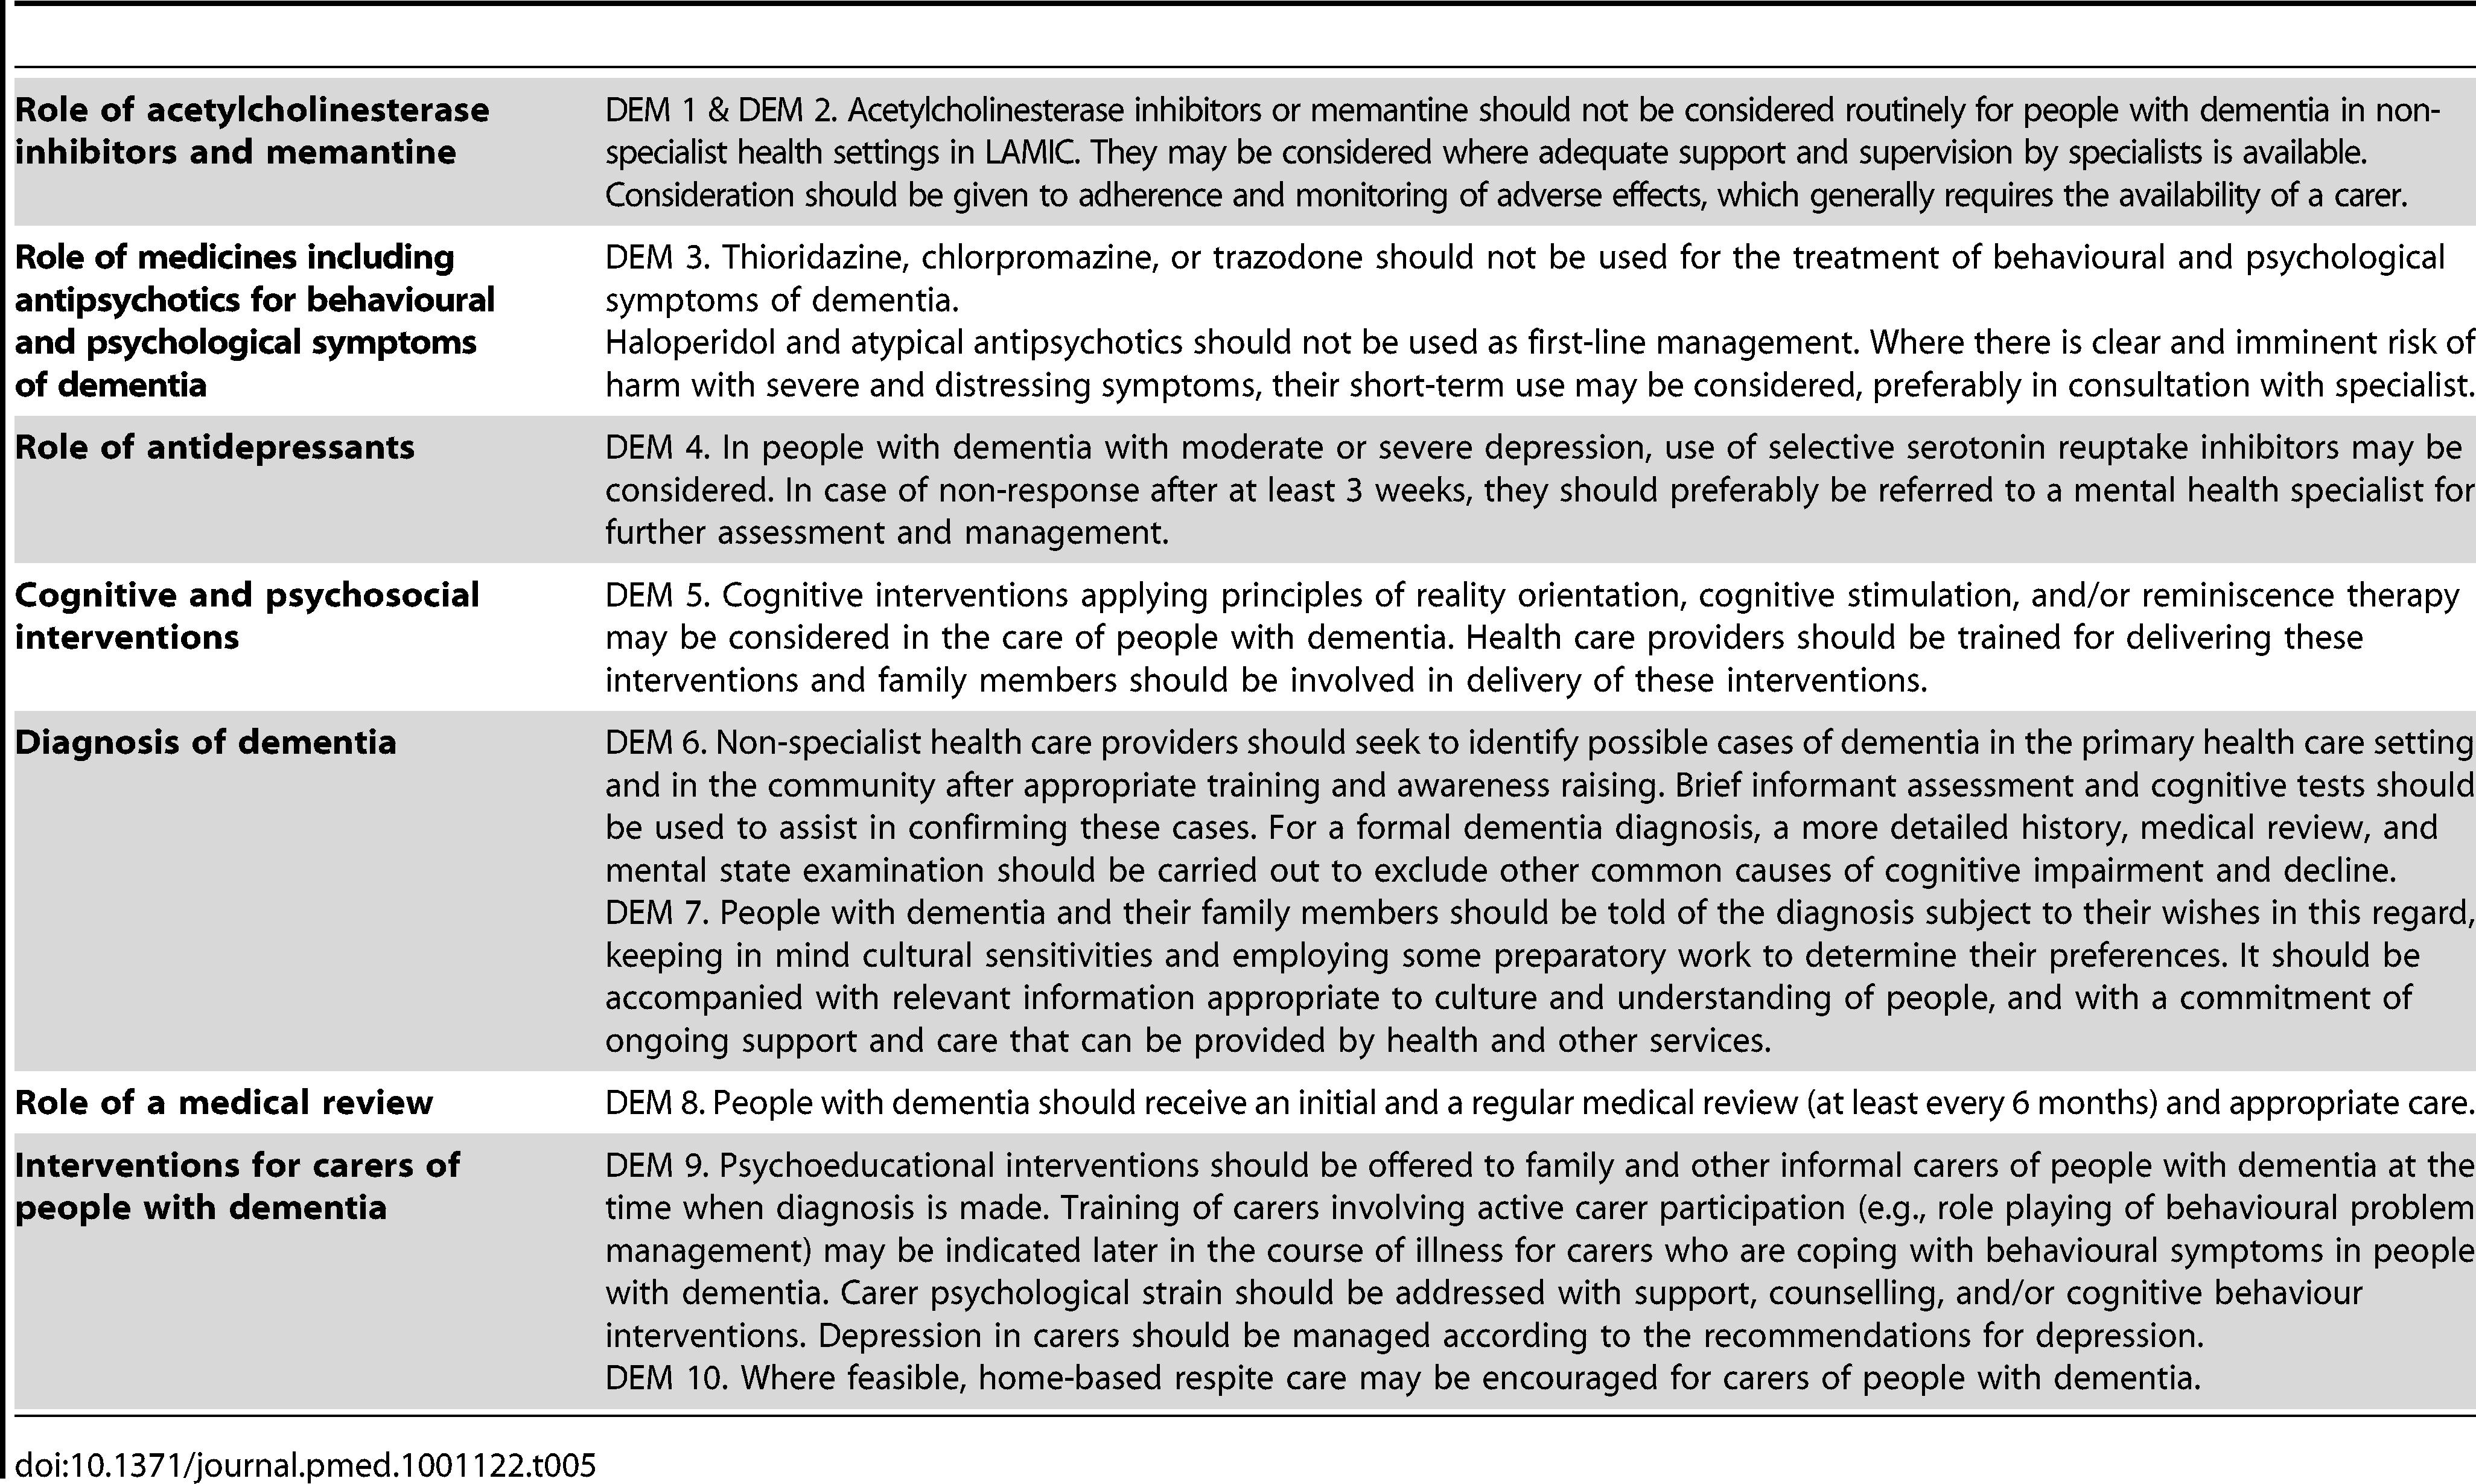 Abridged recommendations for dementia (DEM 1–10).